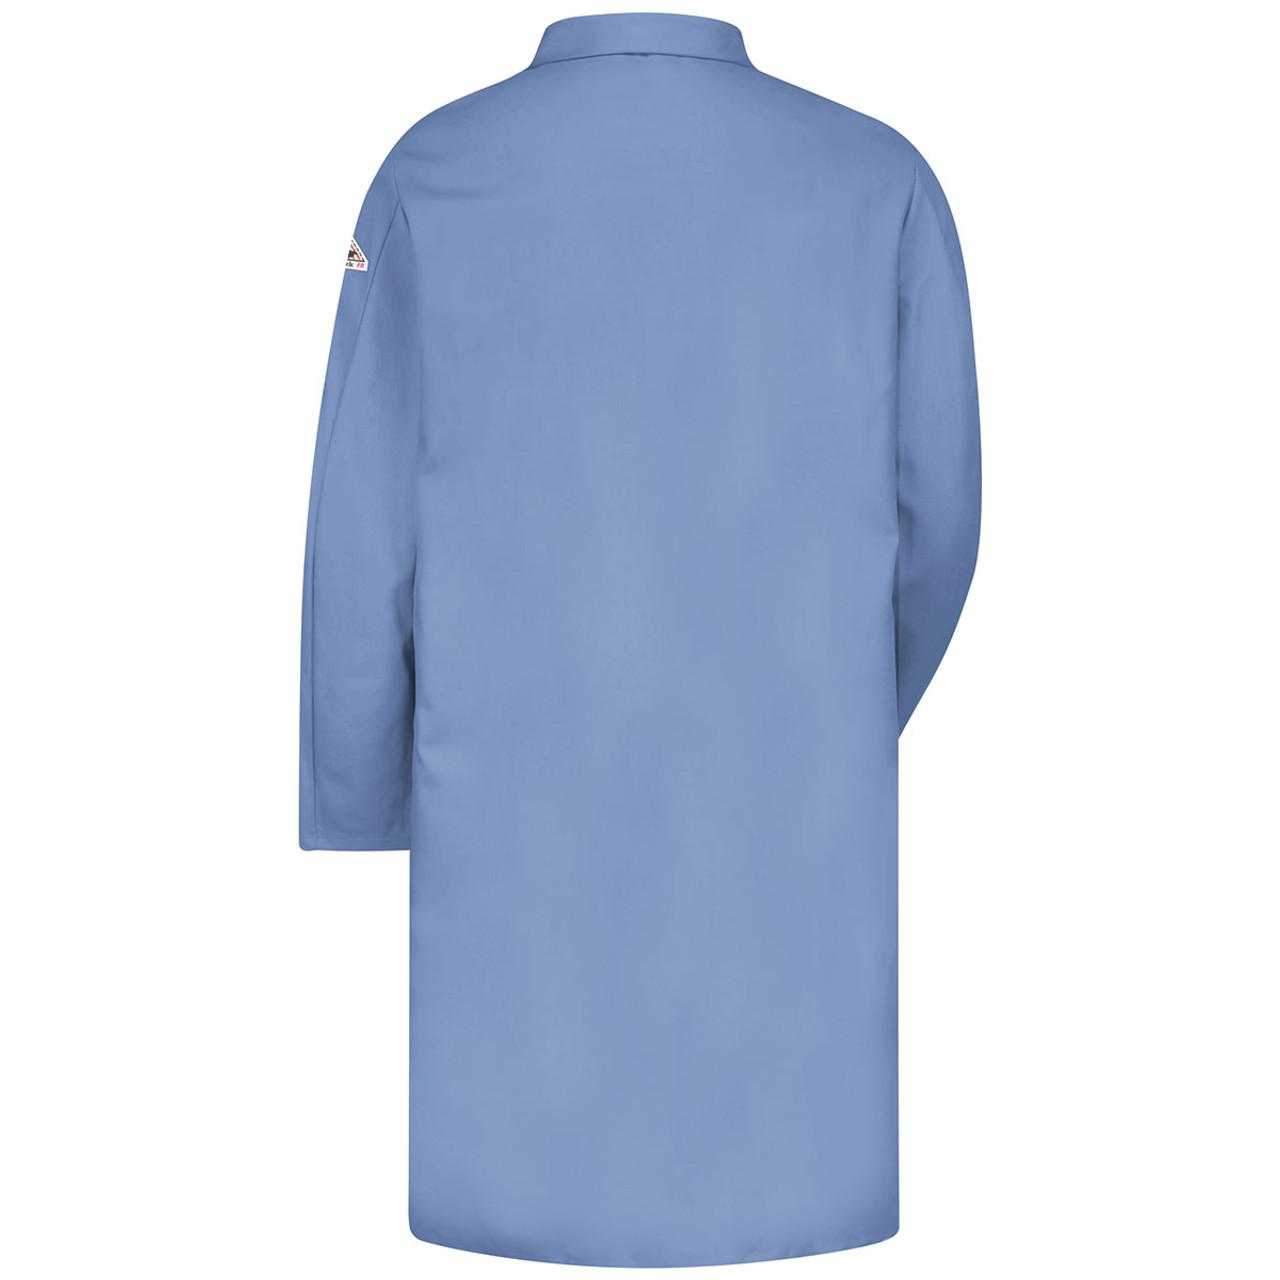 ATPV 7.7 Bulwark Flame Resistant Lab Coat EXCEL FR® Light Blue style # KEL2LB